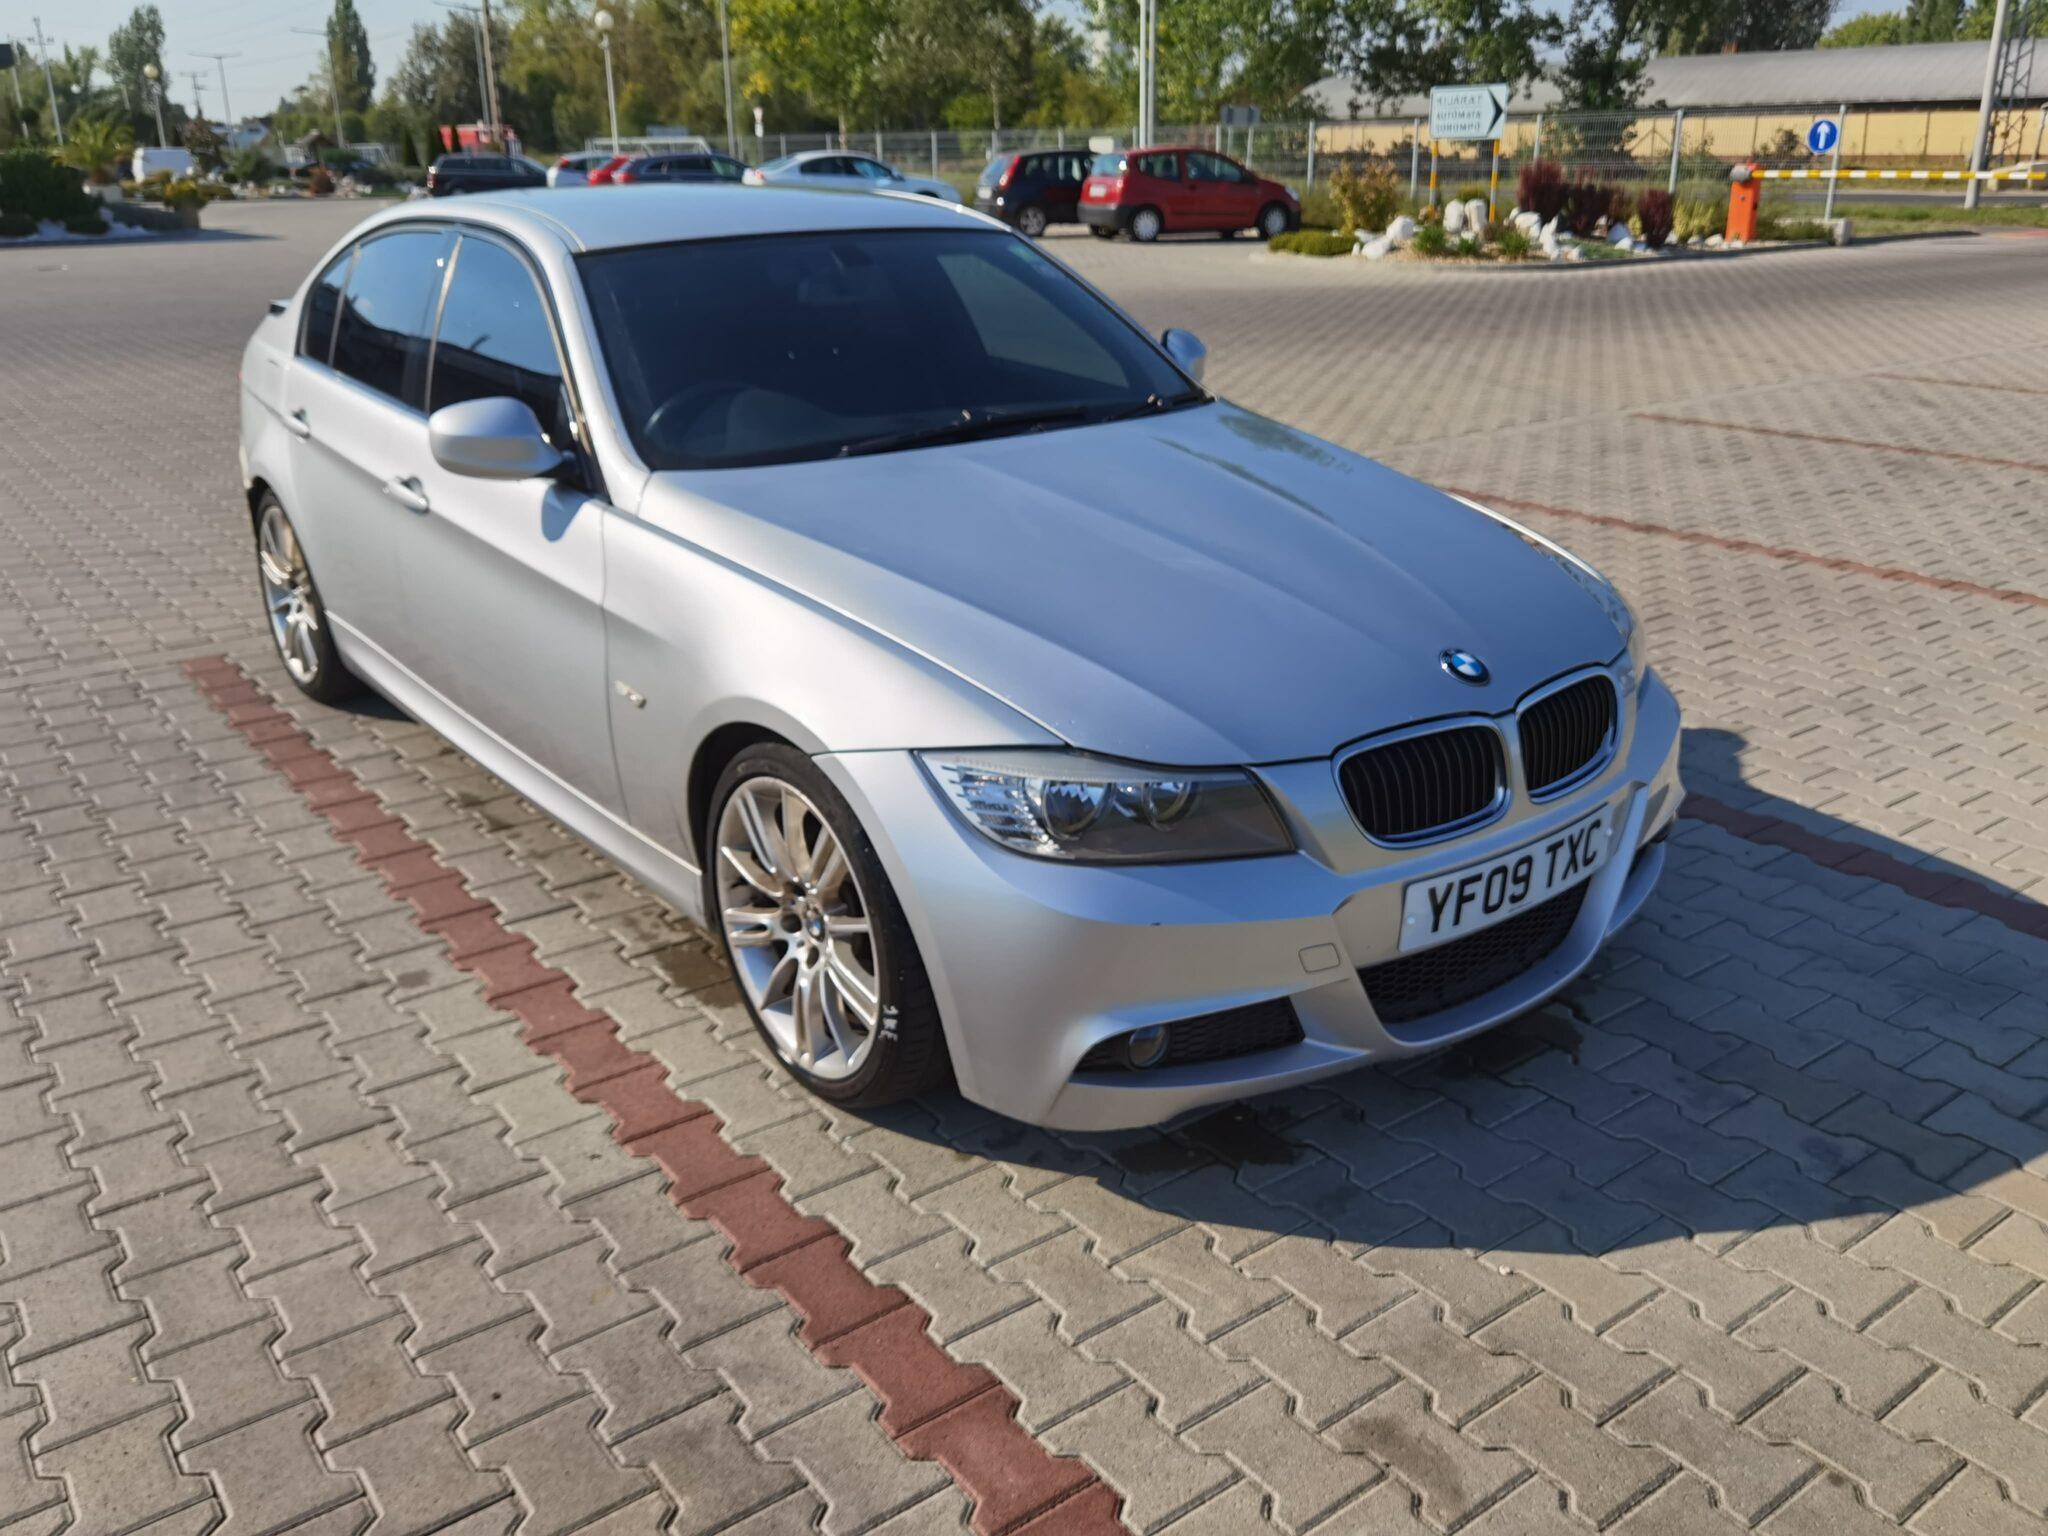 BMW E90 lci 318d Carbon Car Center Békéscsaba-11